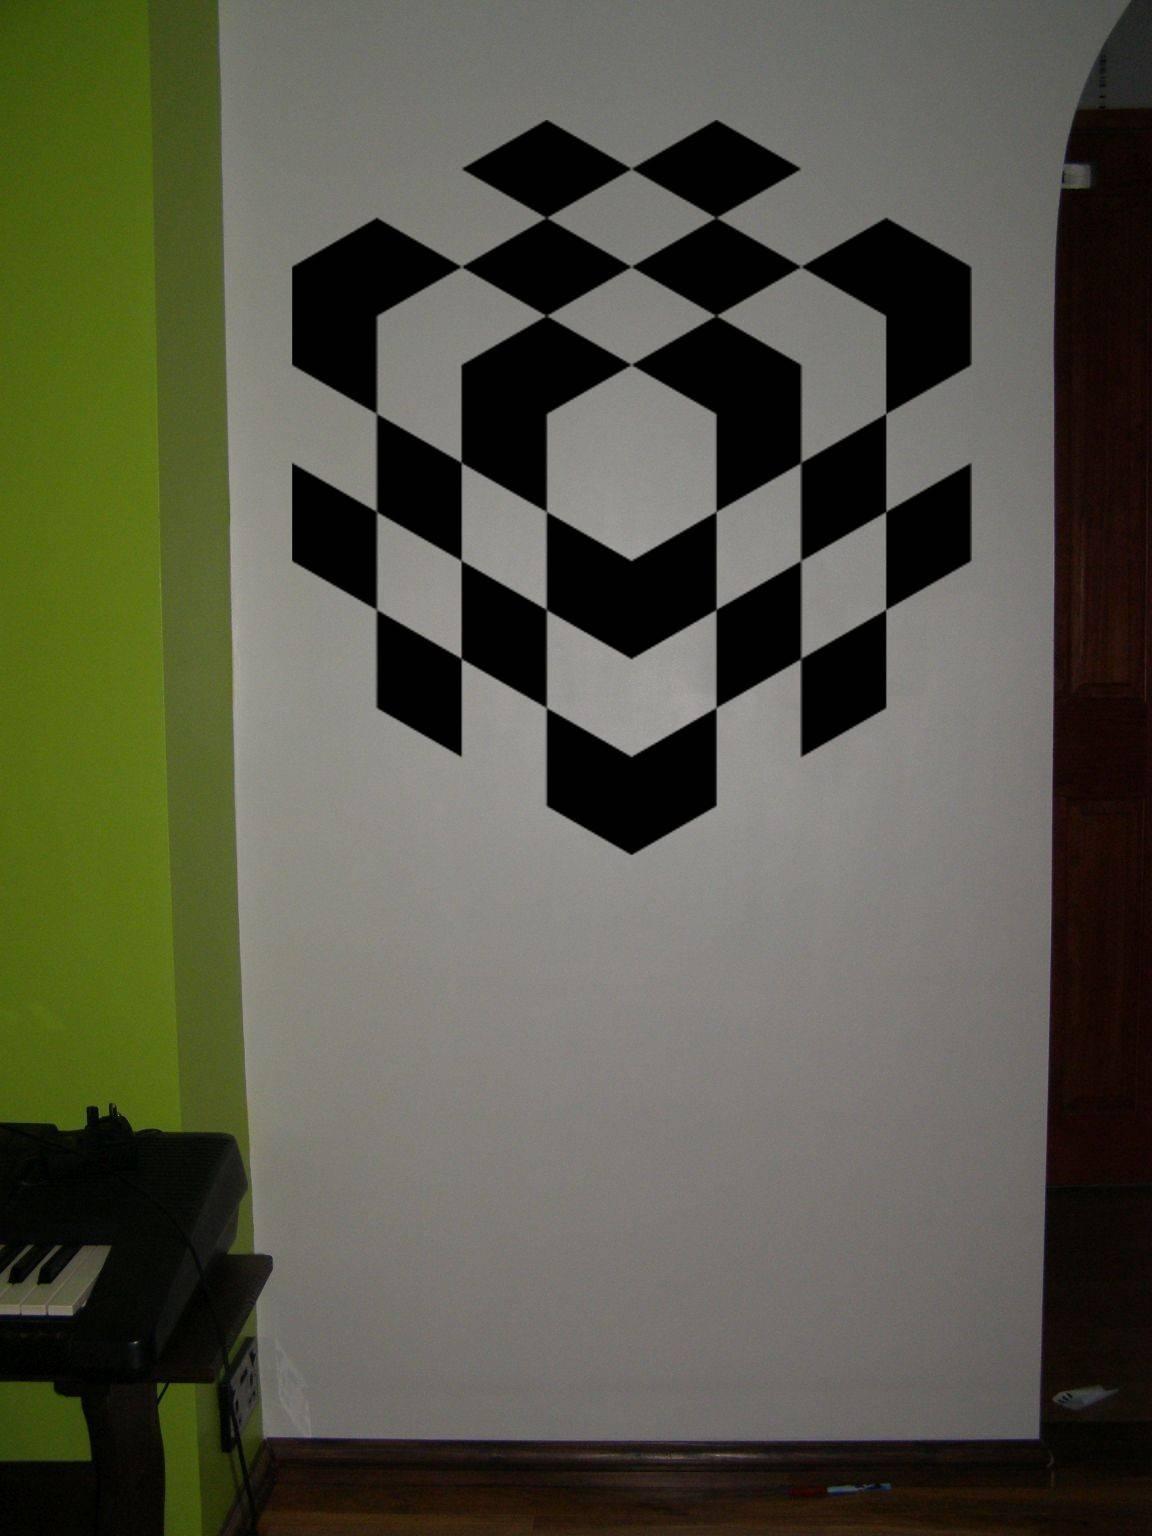 3D Chess Cube Wall Art Sticker (View 8 of 20)